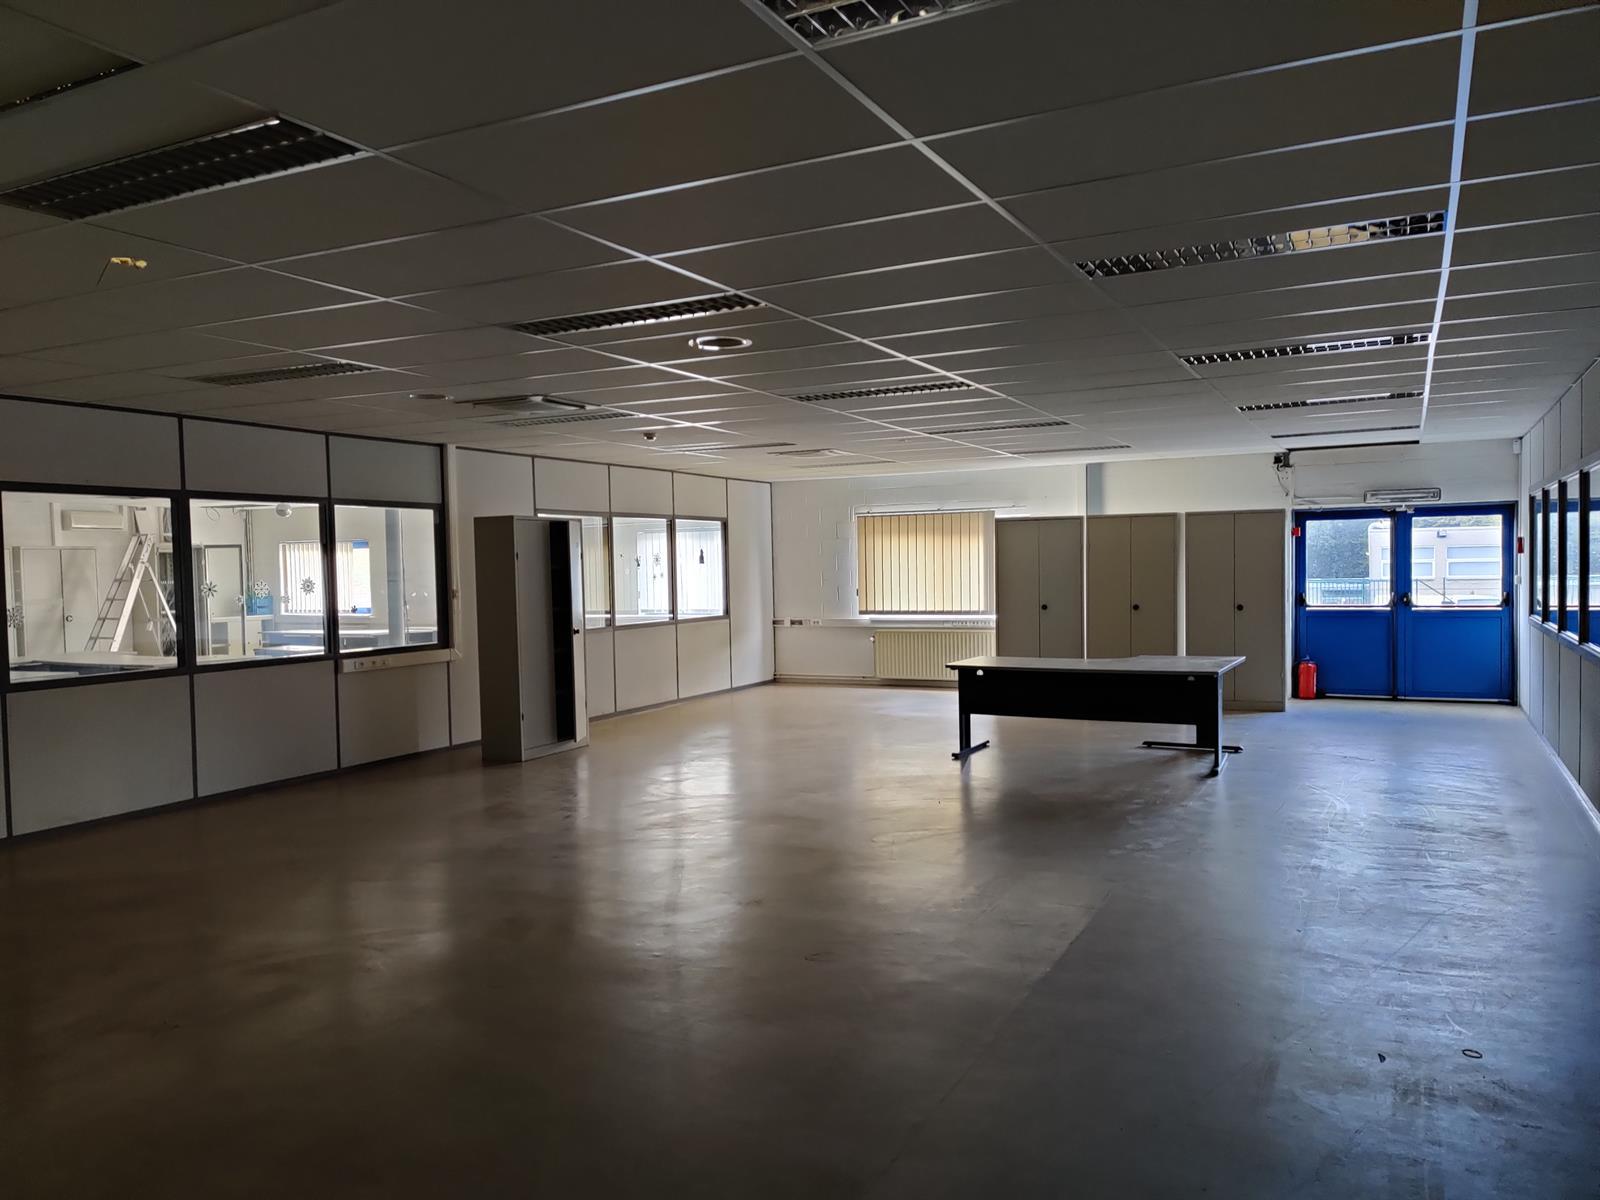 gebouw voor gemengd gebruik te huur I173 - Quatrieme Rue , 6040 Charleroi Jumet, België 29